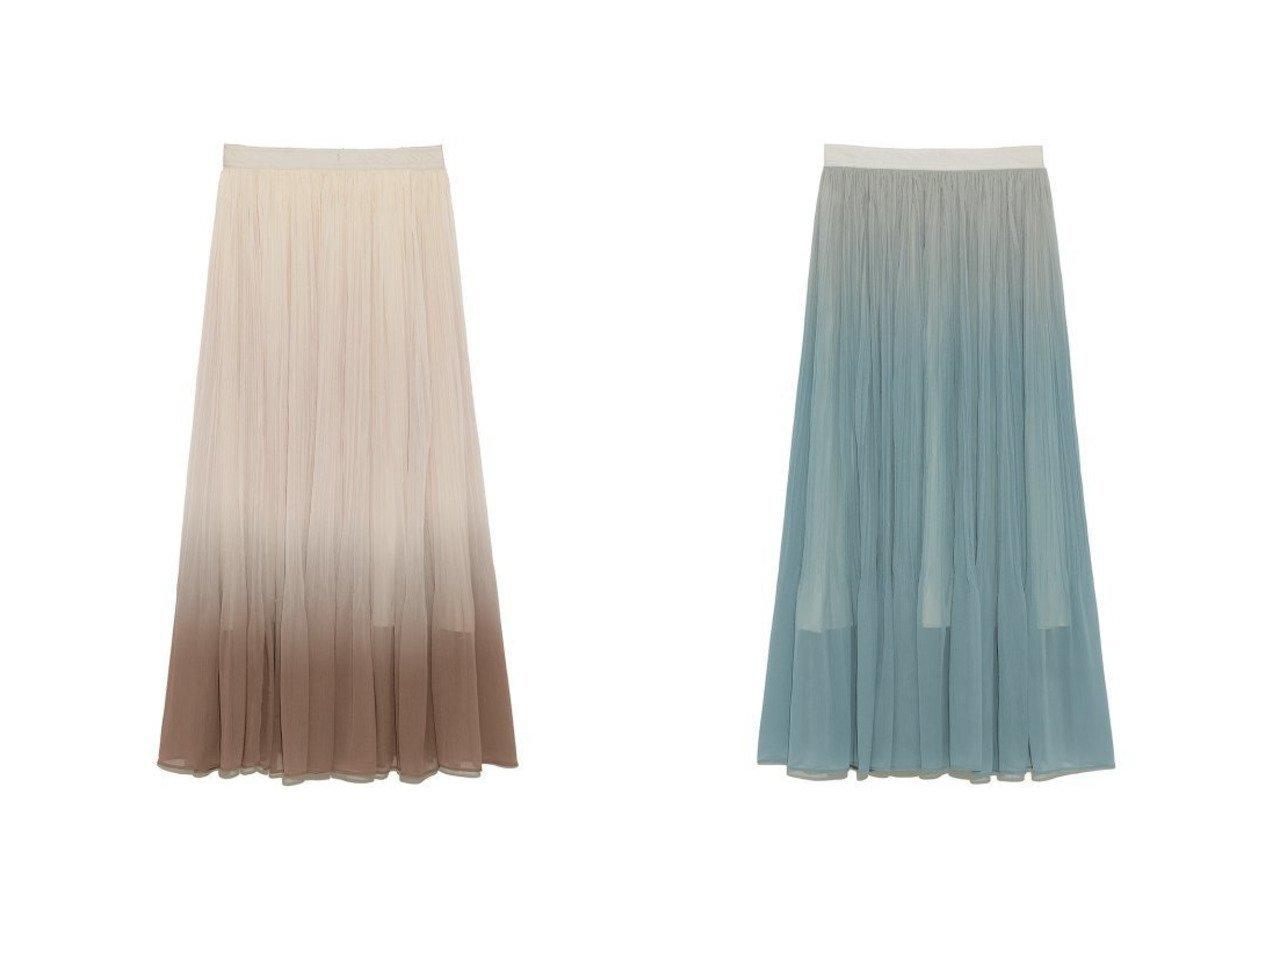 【Lily Brown/リリーブラウン】のエアリープリーツスカート 【スカート】おすすめ!人気、トレンド・レディースファッションの通販 おすすめで人気の流行・トレンド、ファッションの通販商品 インテリア・家具・メンズファッション・キッズファッション・レディースファッション・服の通販 founy(ファニー) https://founy.com/ ファッション Fashion レディースファッション WOMEN スカート Skirt プリーツスカート Pleated Skirts 春 Spring グラデーション サテン シアー シフォン スマート トレンド 定番 Standard フィット プリント プリーツ S/S・春夏 SS・Spring/Summer |ID:crp329100000044075